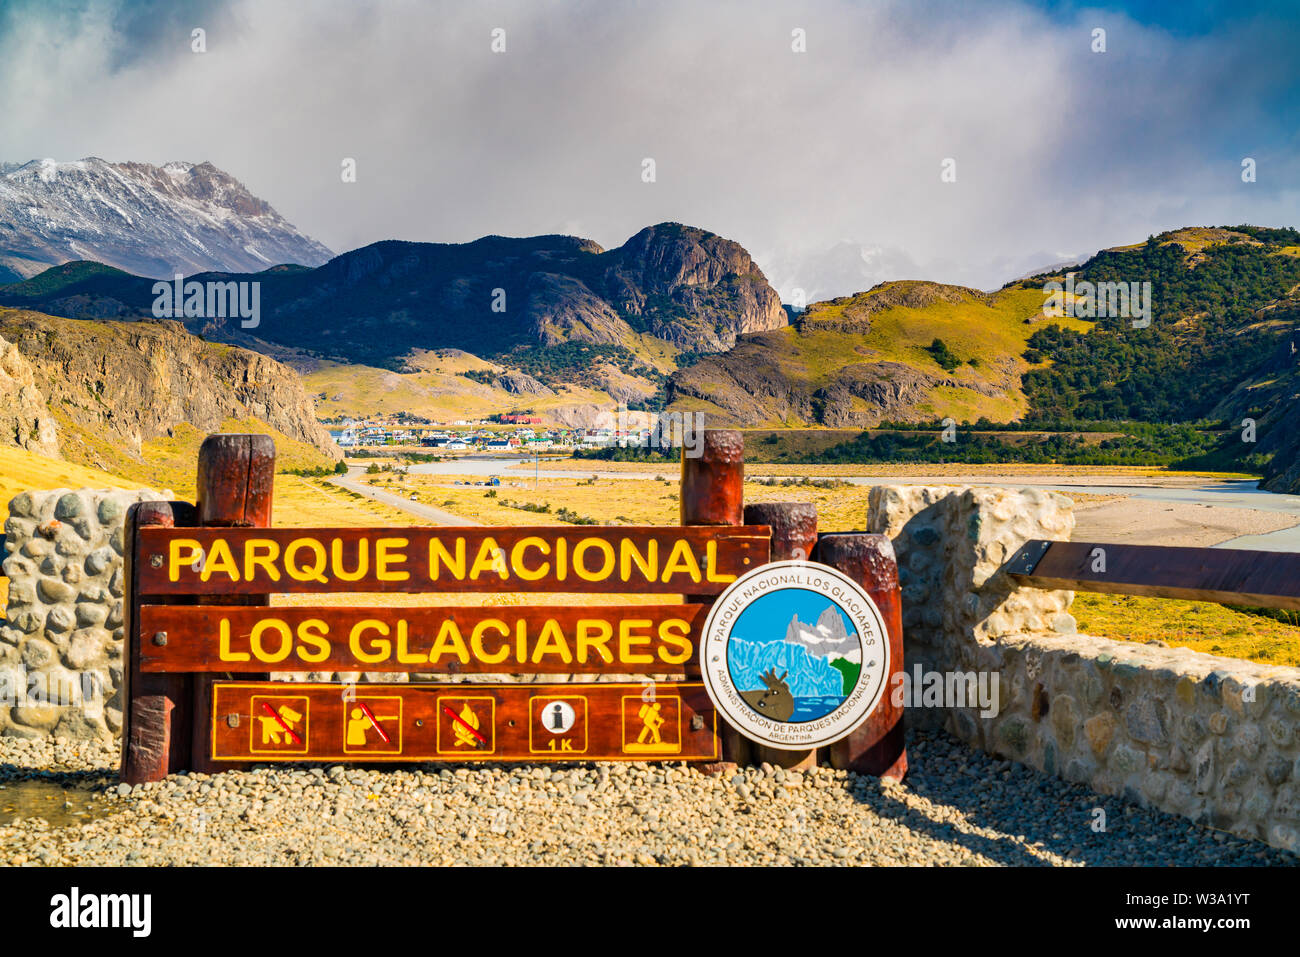 Village of El Chalten and the Los Glaciares National Park sign in Argentina - Stock Image